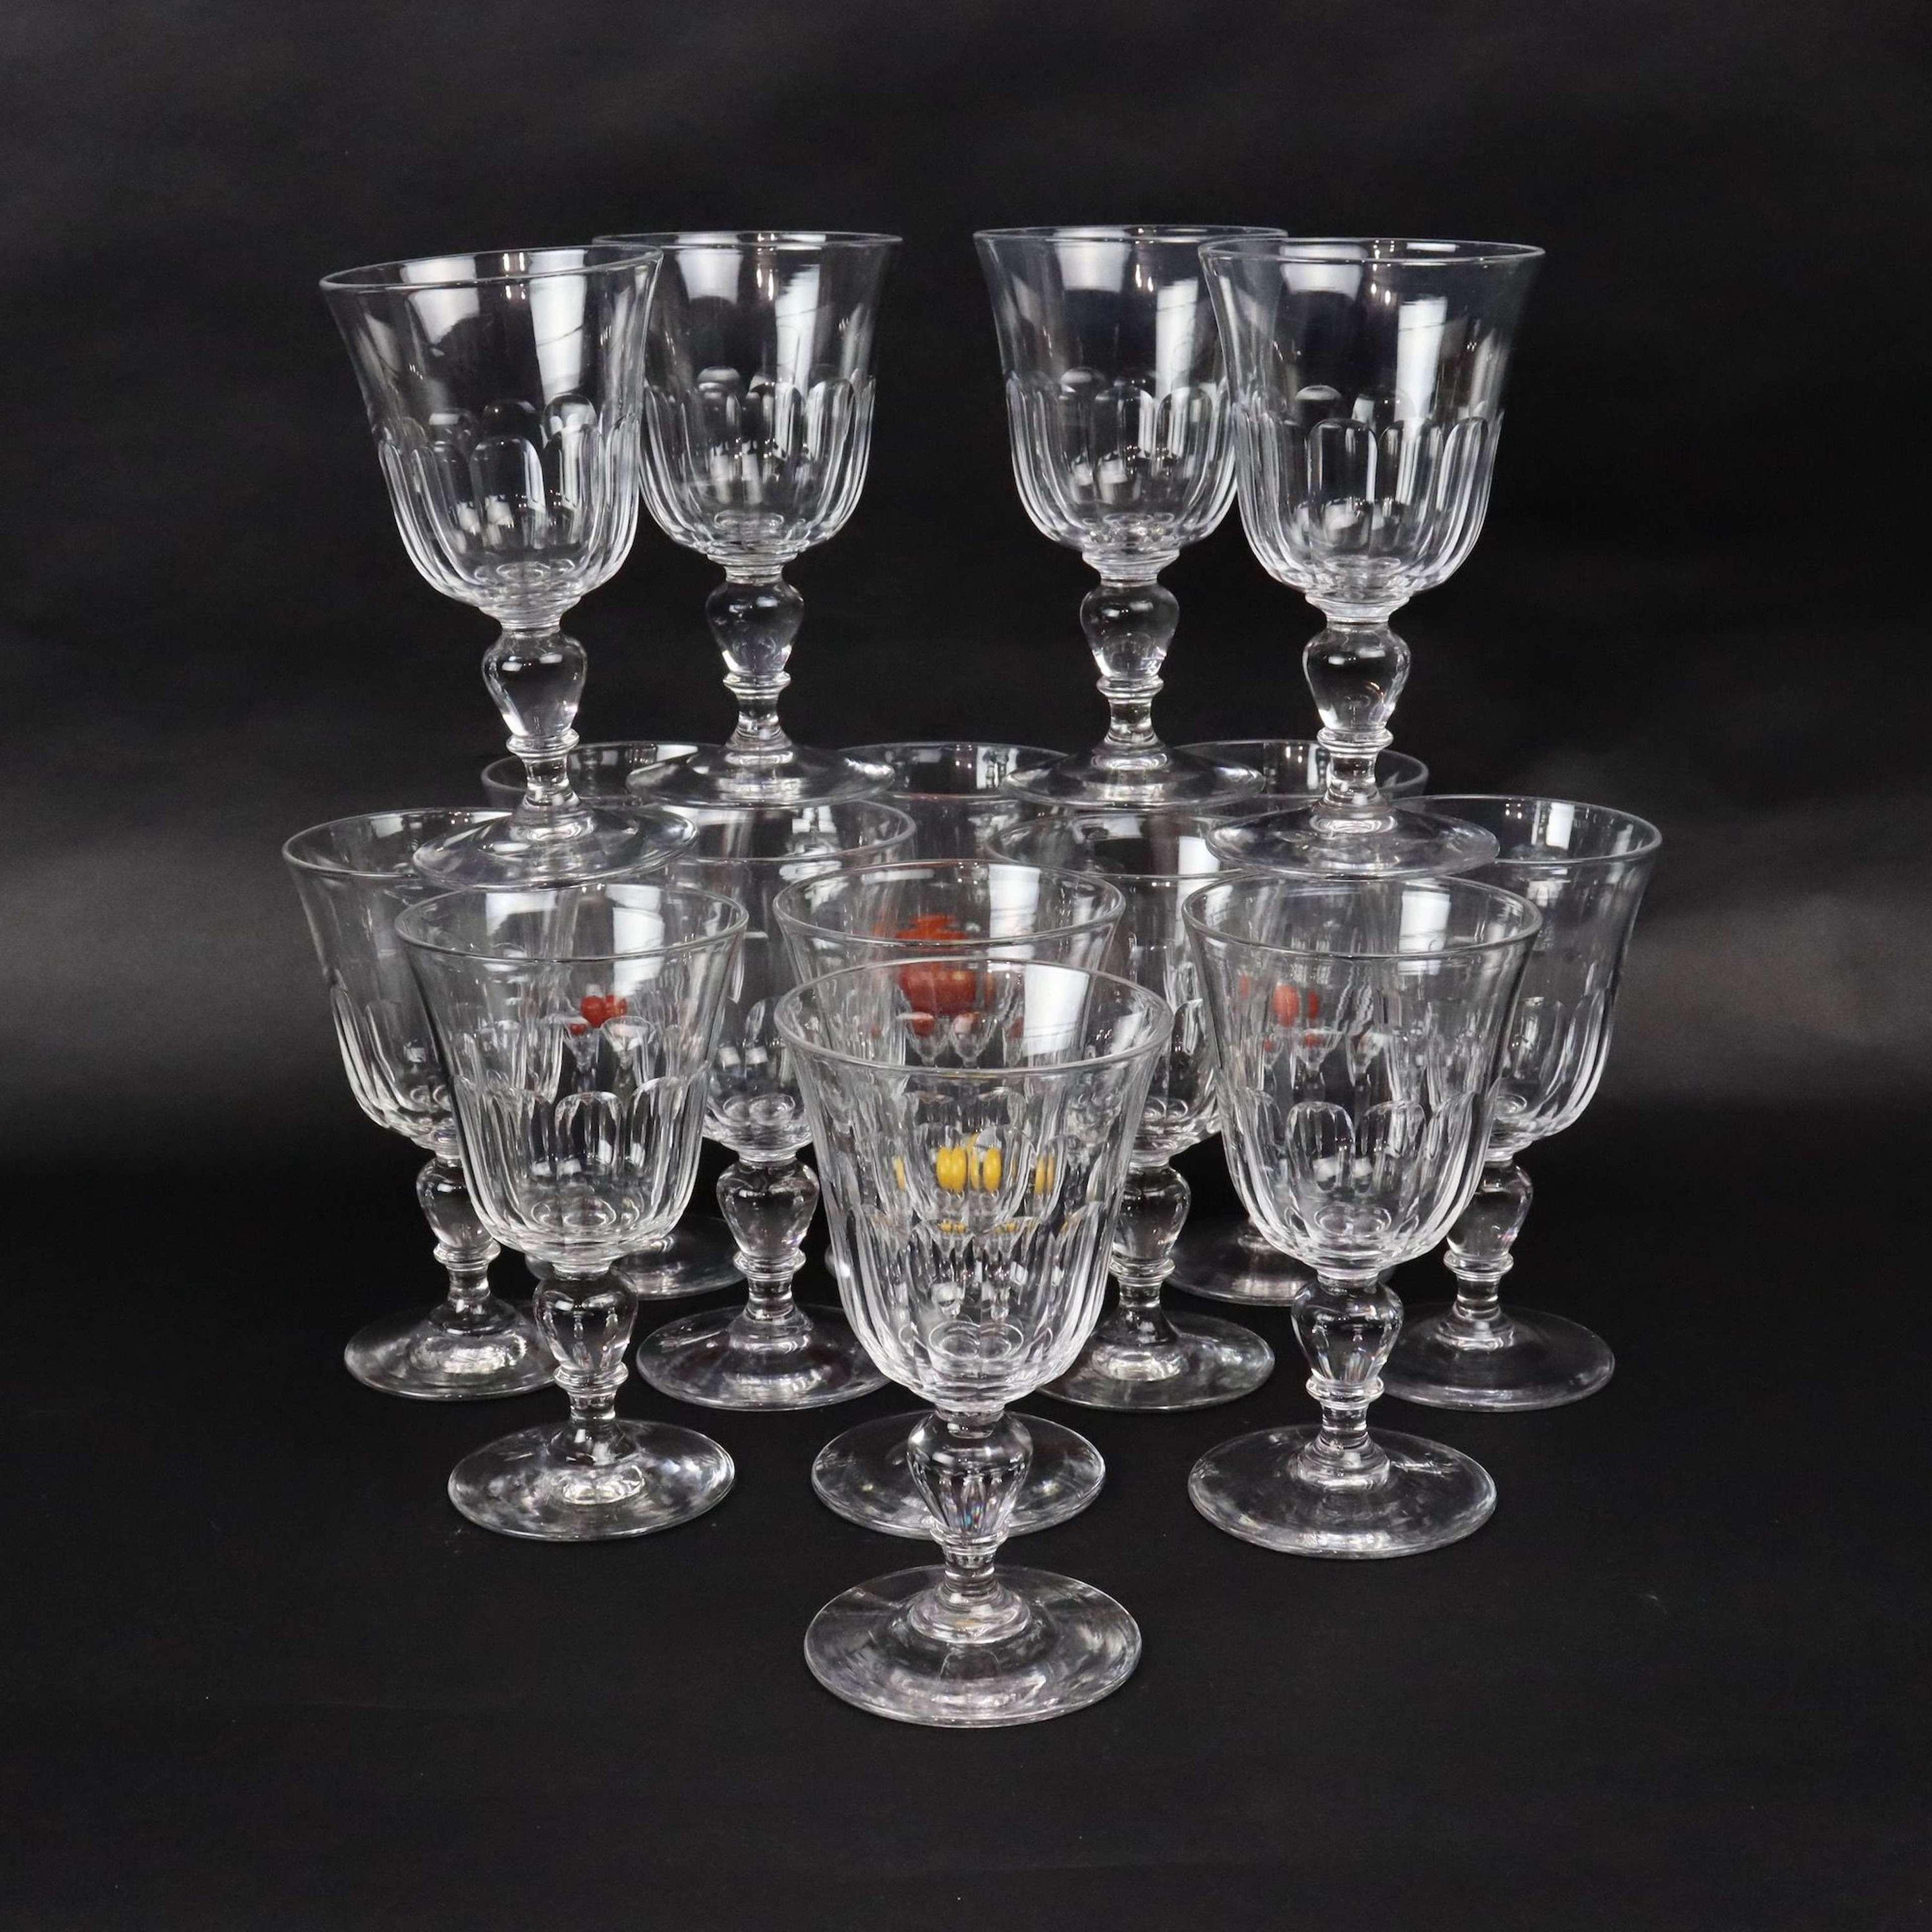 Baccarat crystal wine glasses